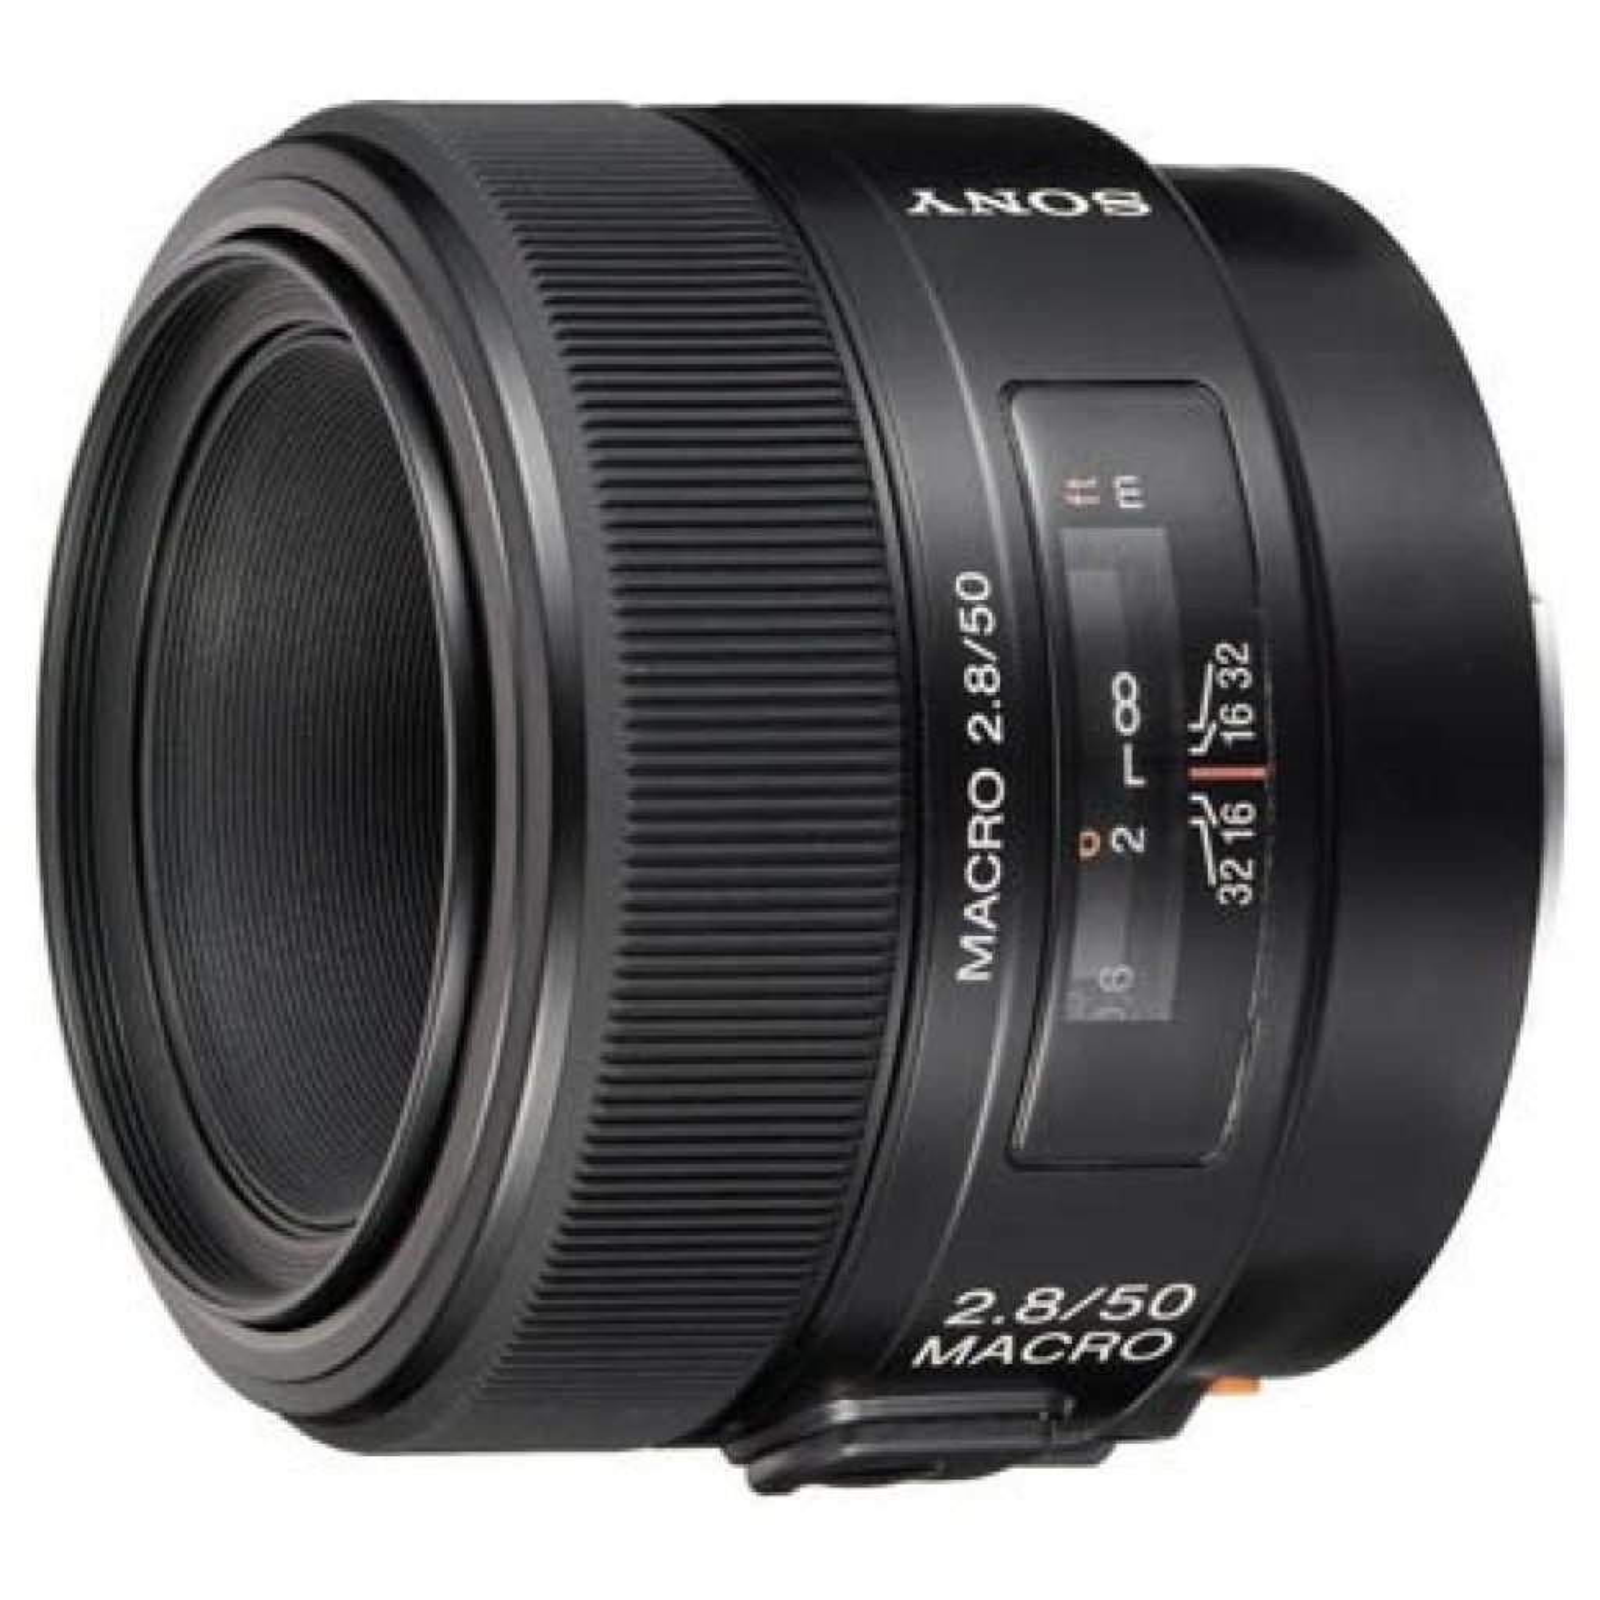 Объектив SONY 50mm f/2.8 macro (SAL50M28.AE)